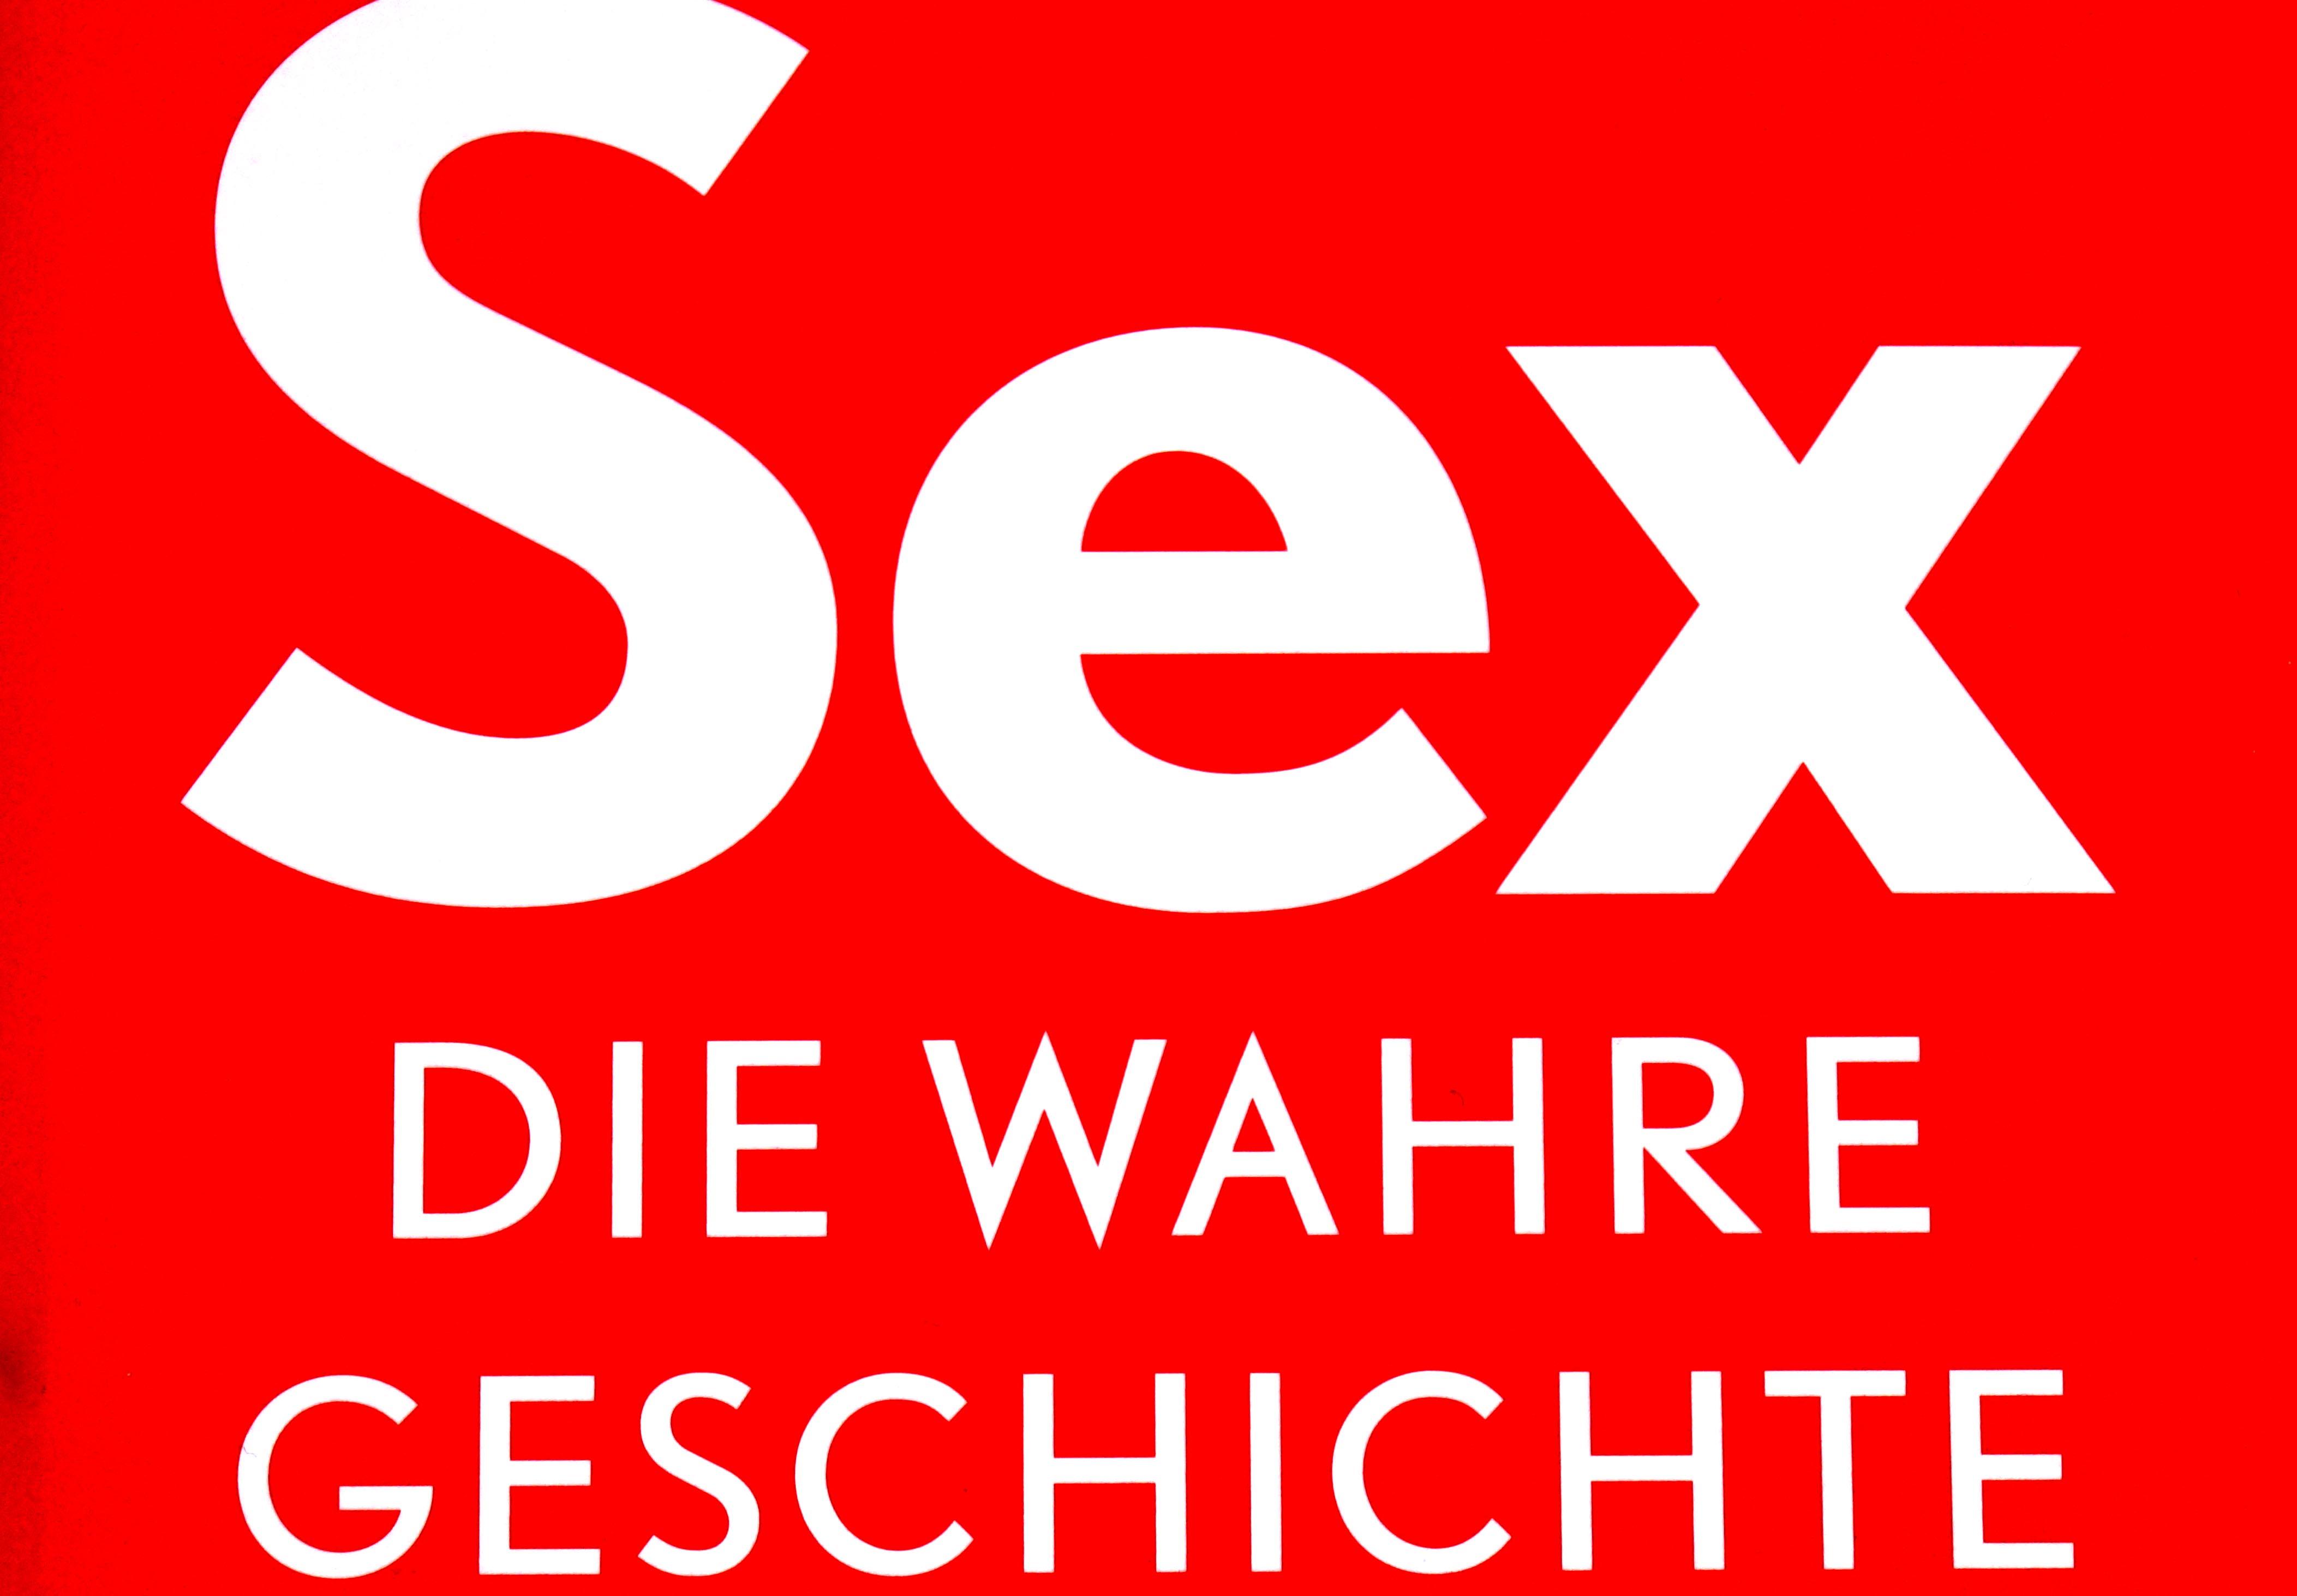 wahre sexerlebnisse de sex